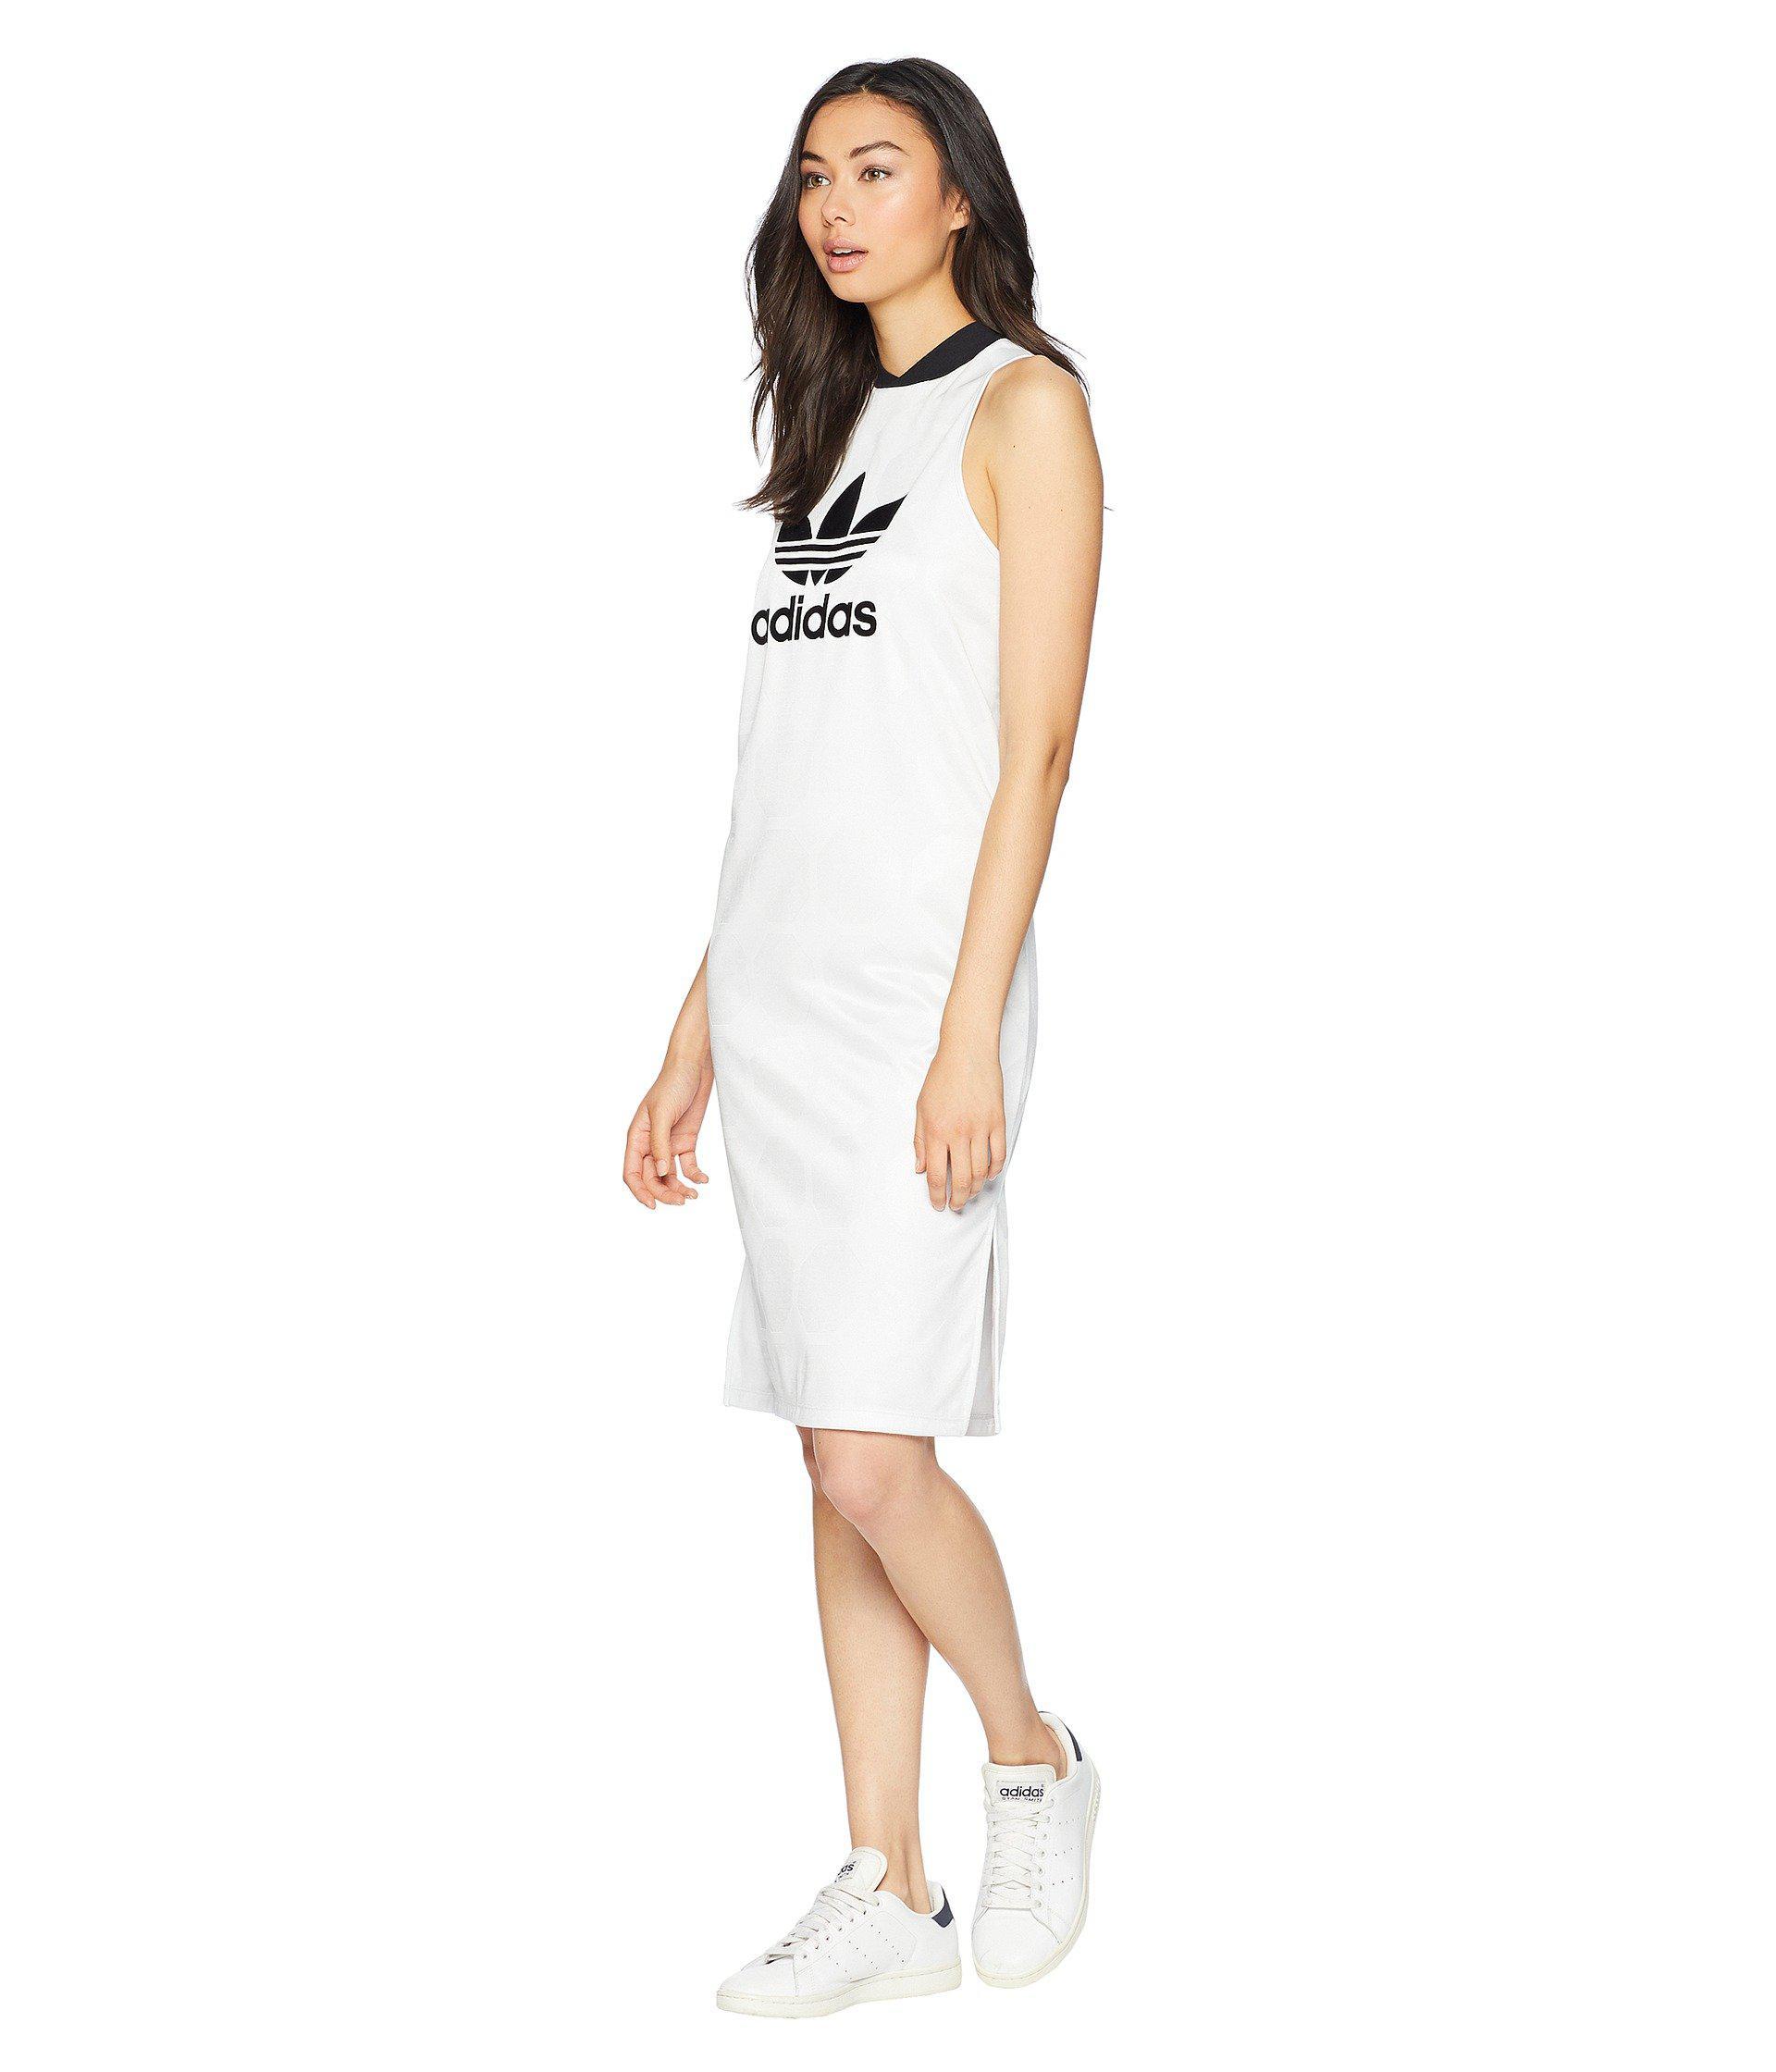 Lyst Adidas Originals League League Jacquard Adidas Tank Dress Dress League (vintage 44c91fe - rigevidogenerati.website